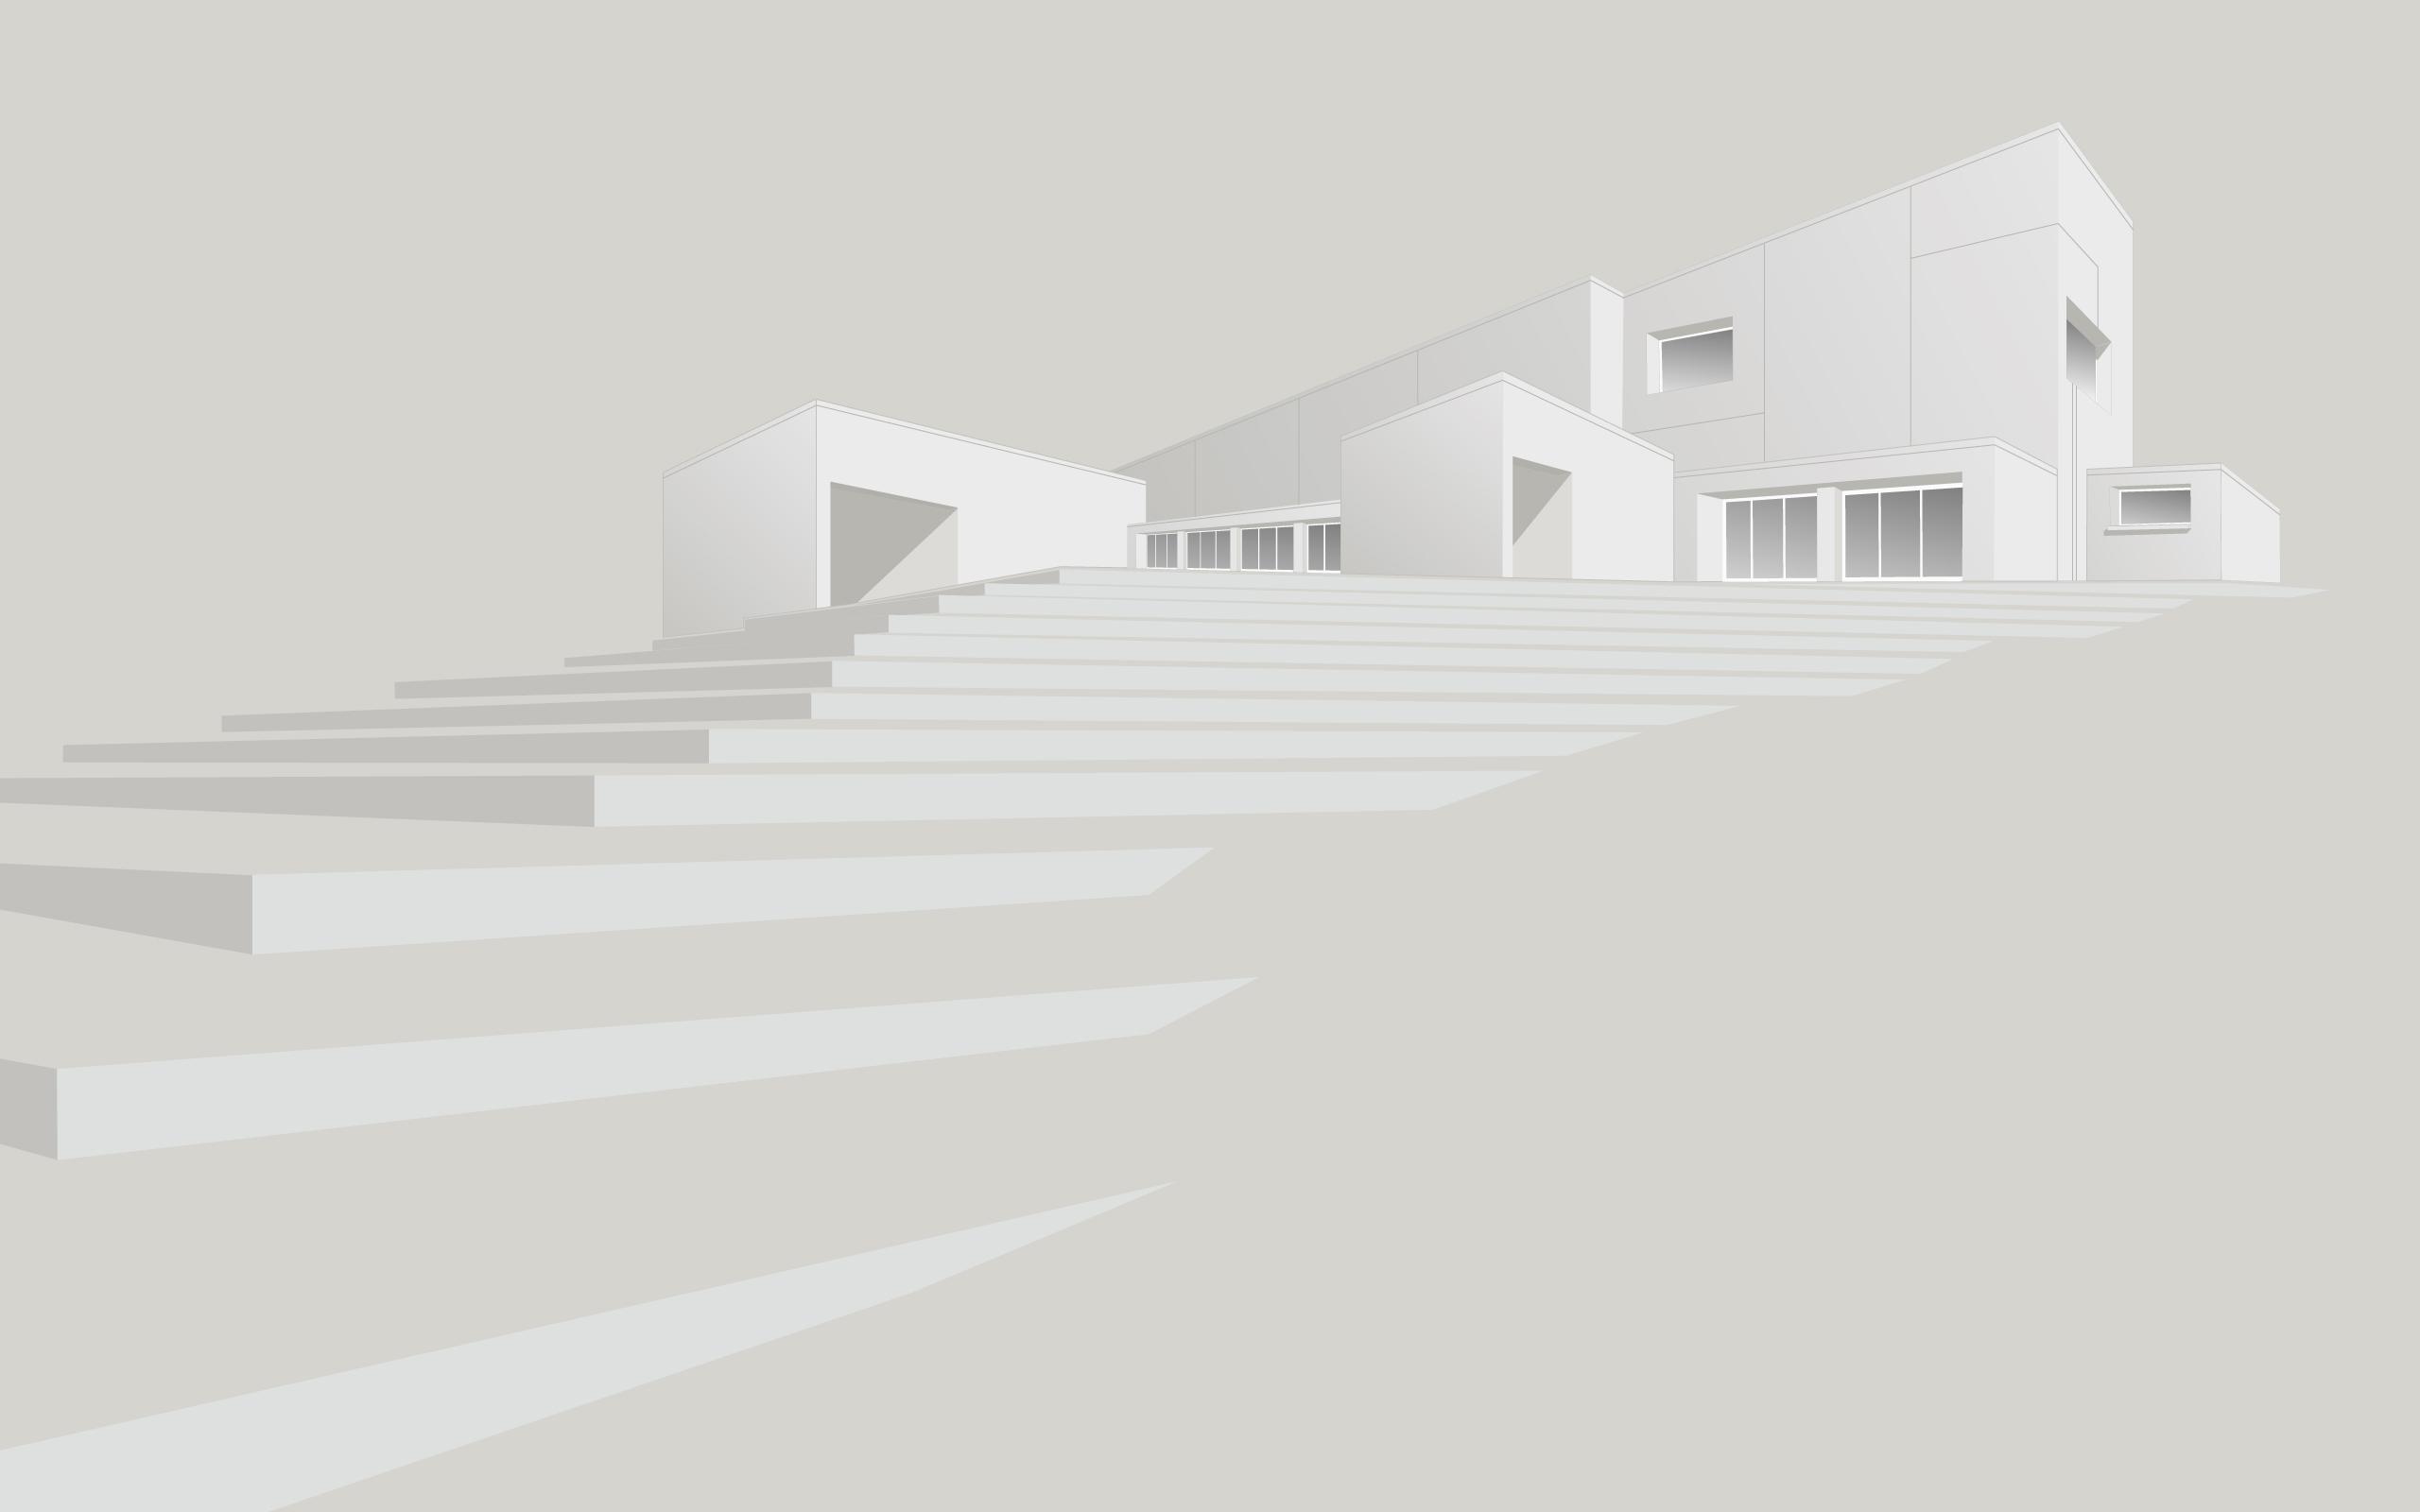 Soft architecture design PPT Backgrounds